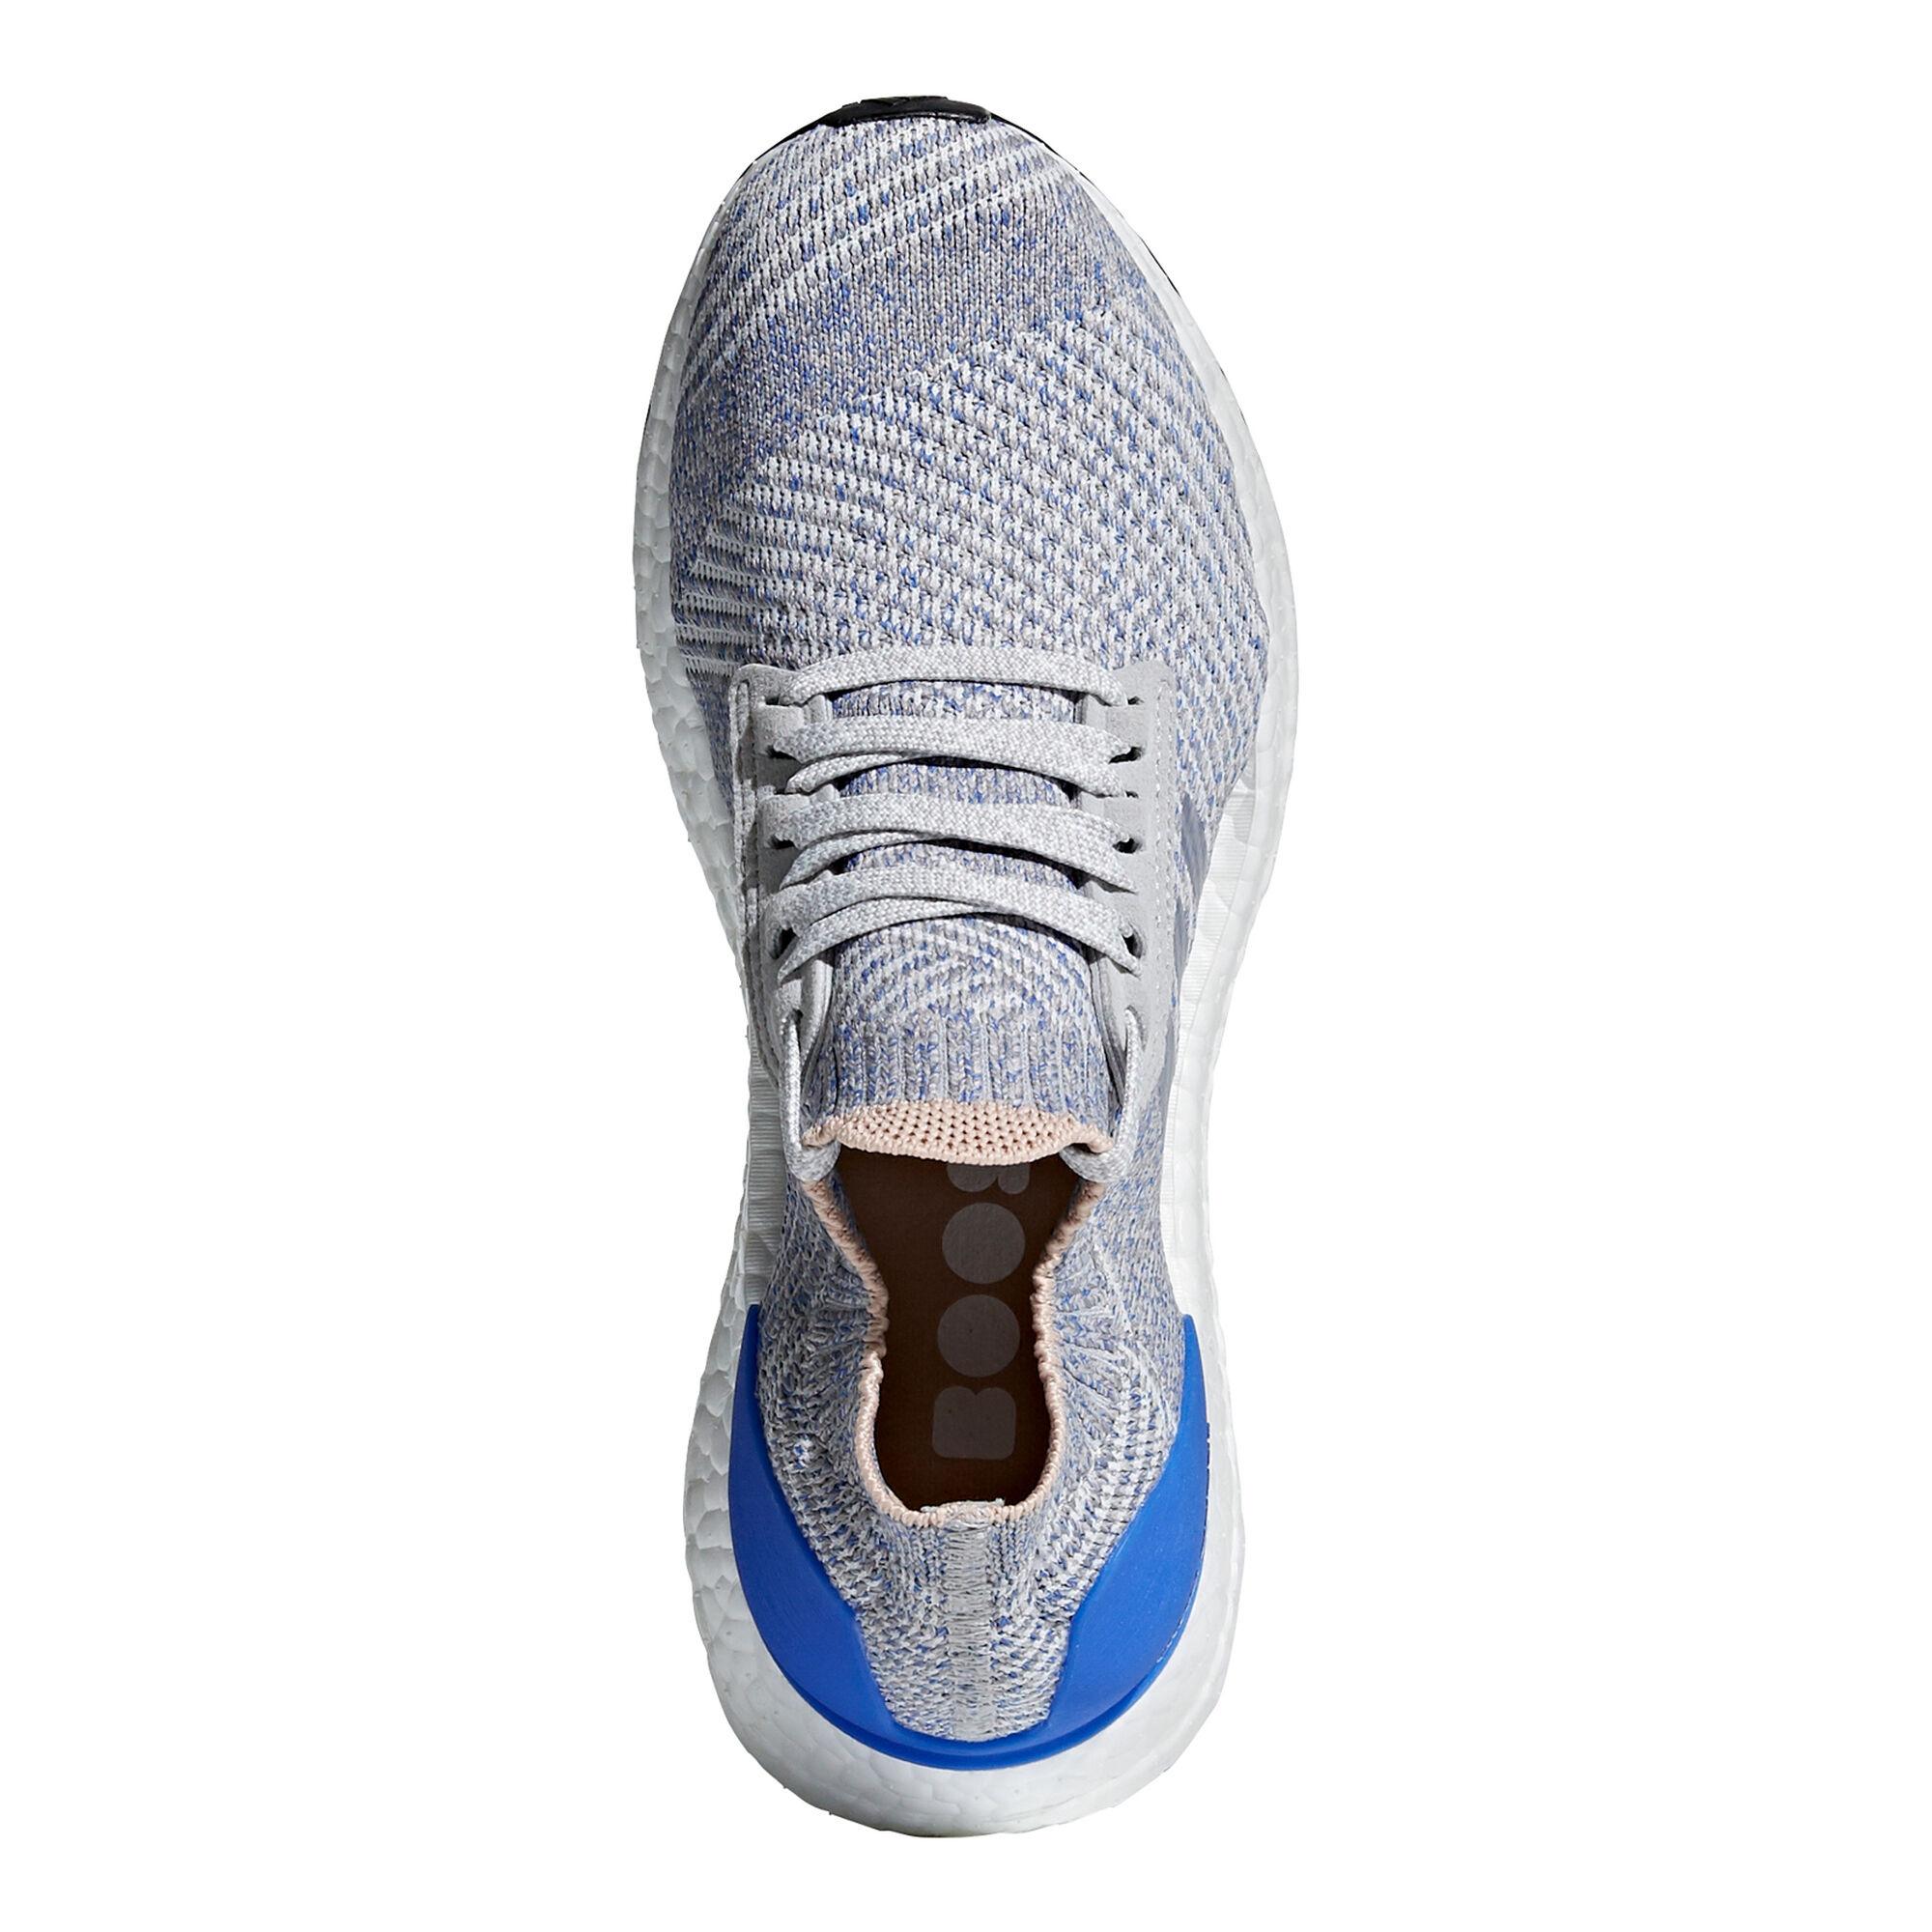 02661ec666e adidas  adidas  adidas  adidas  adidas  adidas  adidas  adidas  adidas. UltraBOOST  X Women ...